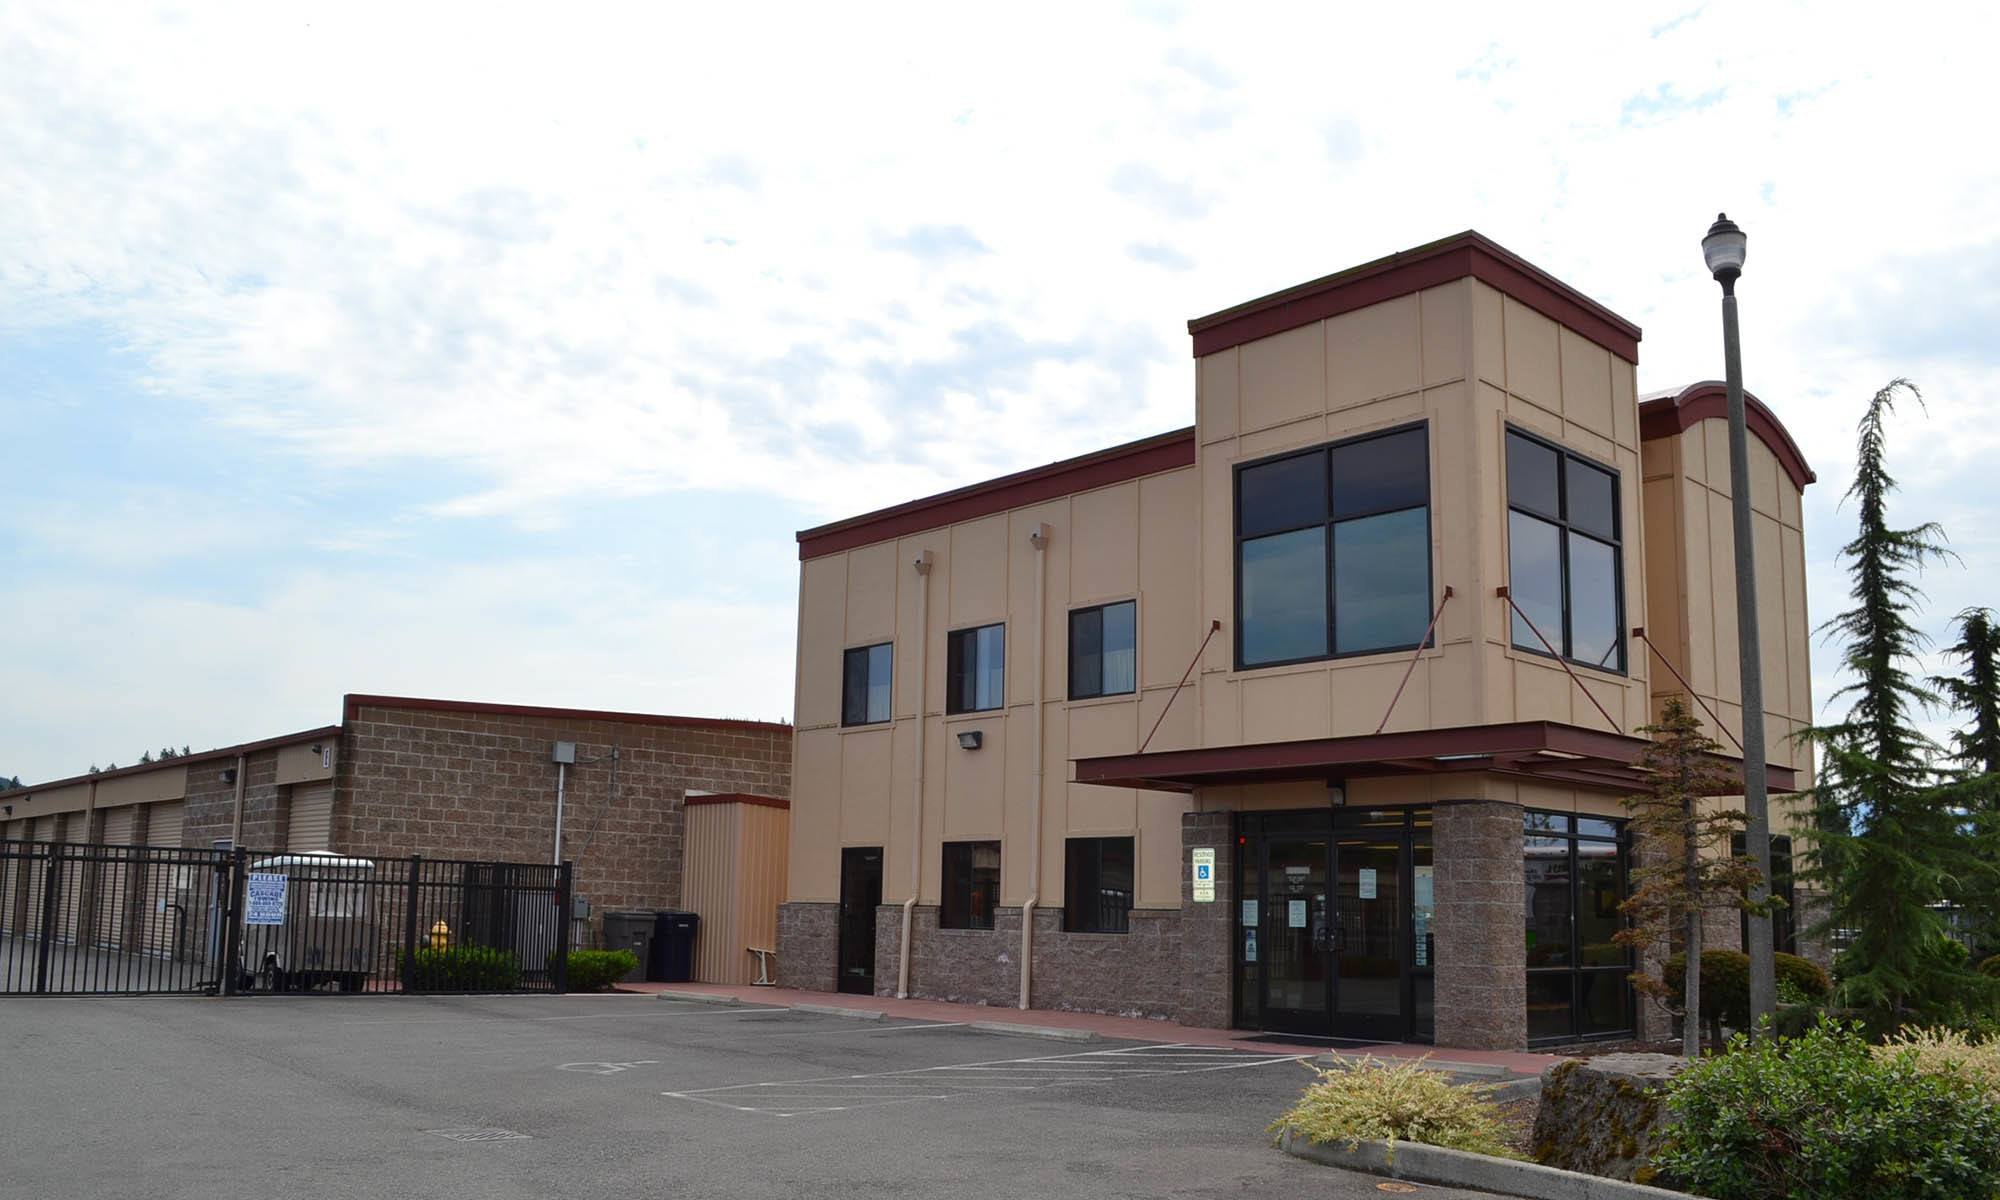 Exterior of self storage facility in Enumclaw, Washington